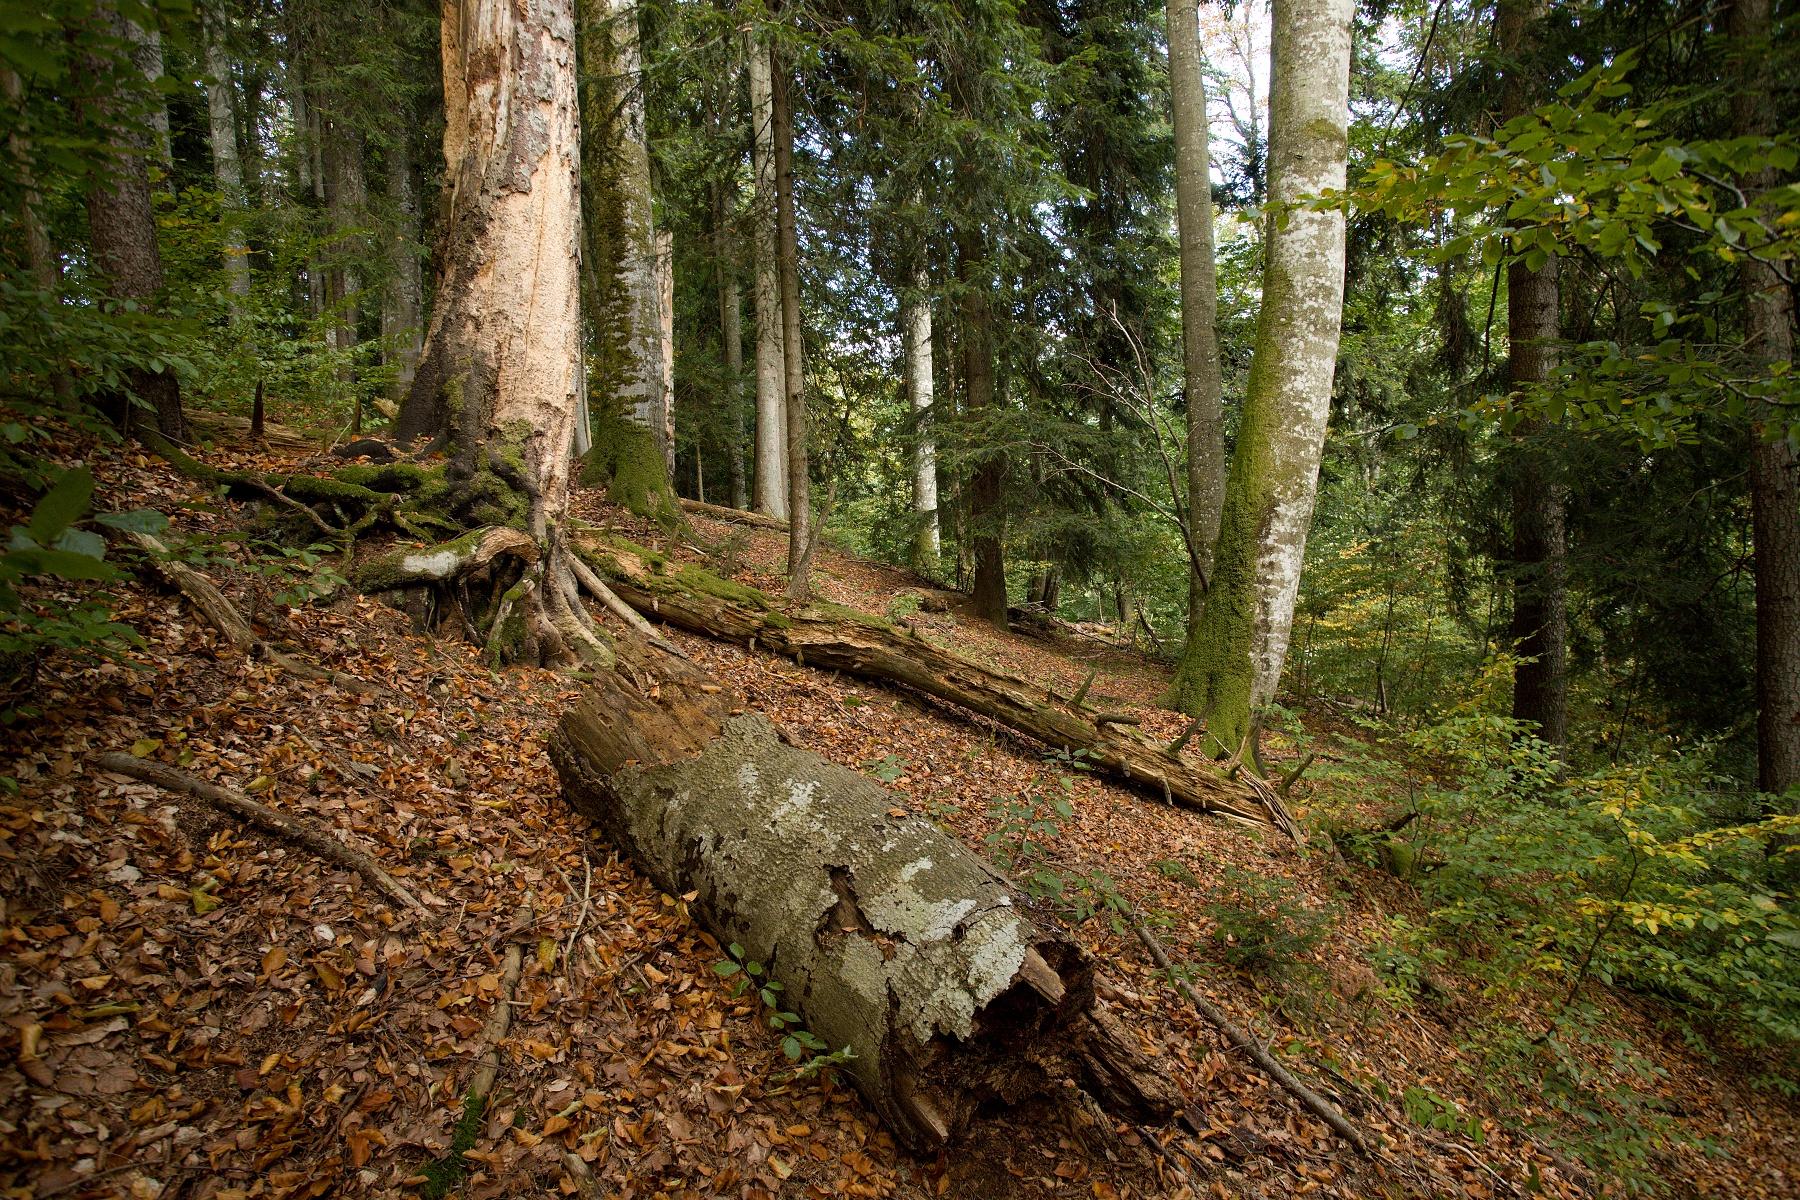 Paulic valley, Munții Maramureșului, Romania Canon EOS 6d mark II + Canon 17-40mm, 20mm, 1/60, f6.3, ISO 1000, 25. september 2020